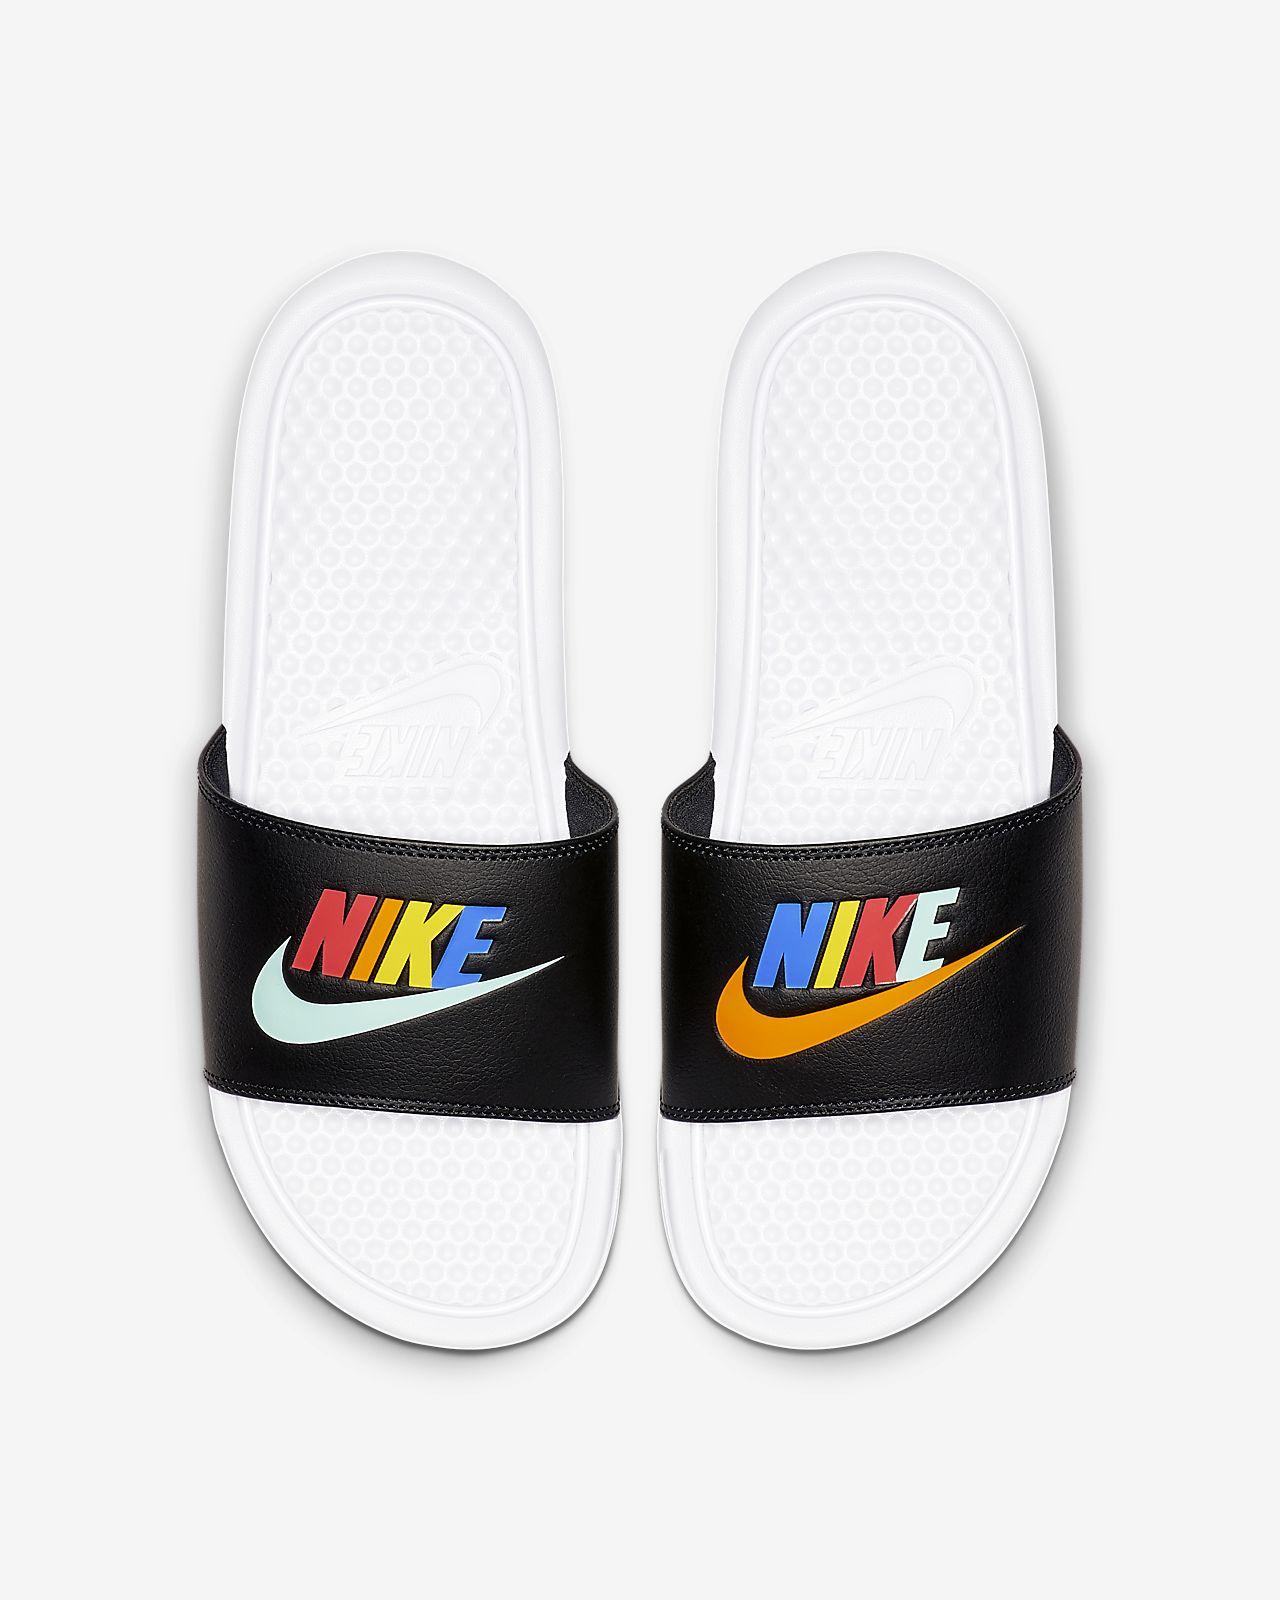 NikeBenassi JDI Mismatch 男子拖鞋